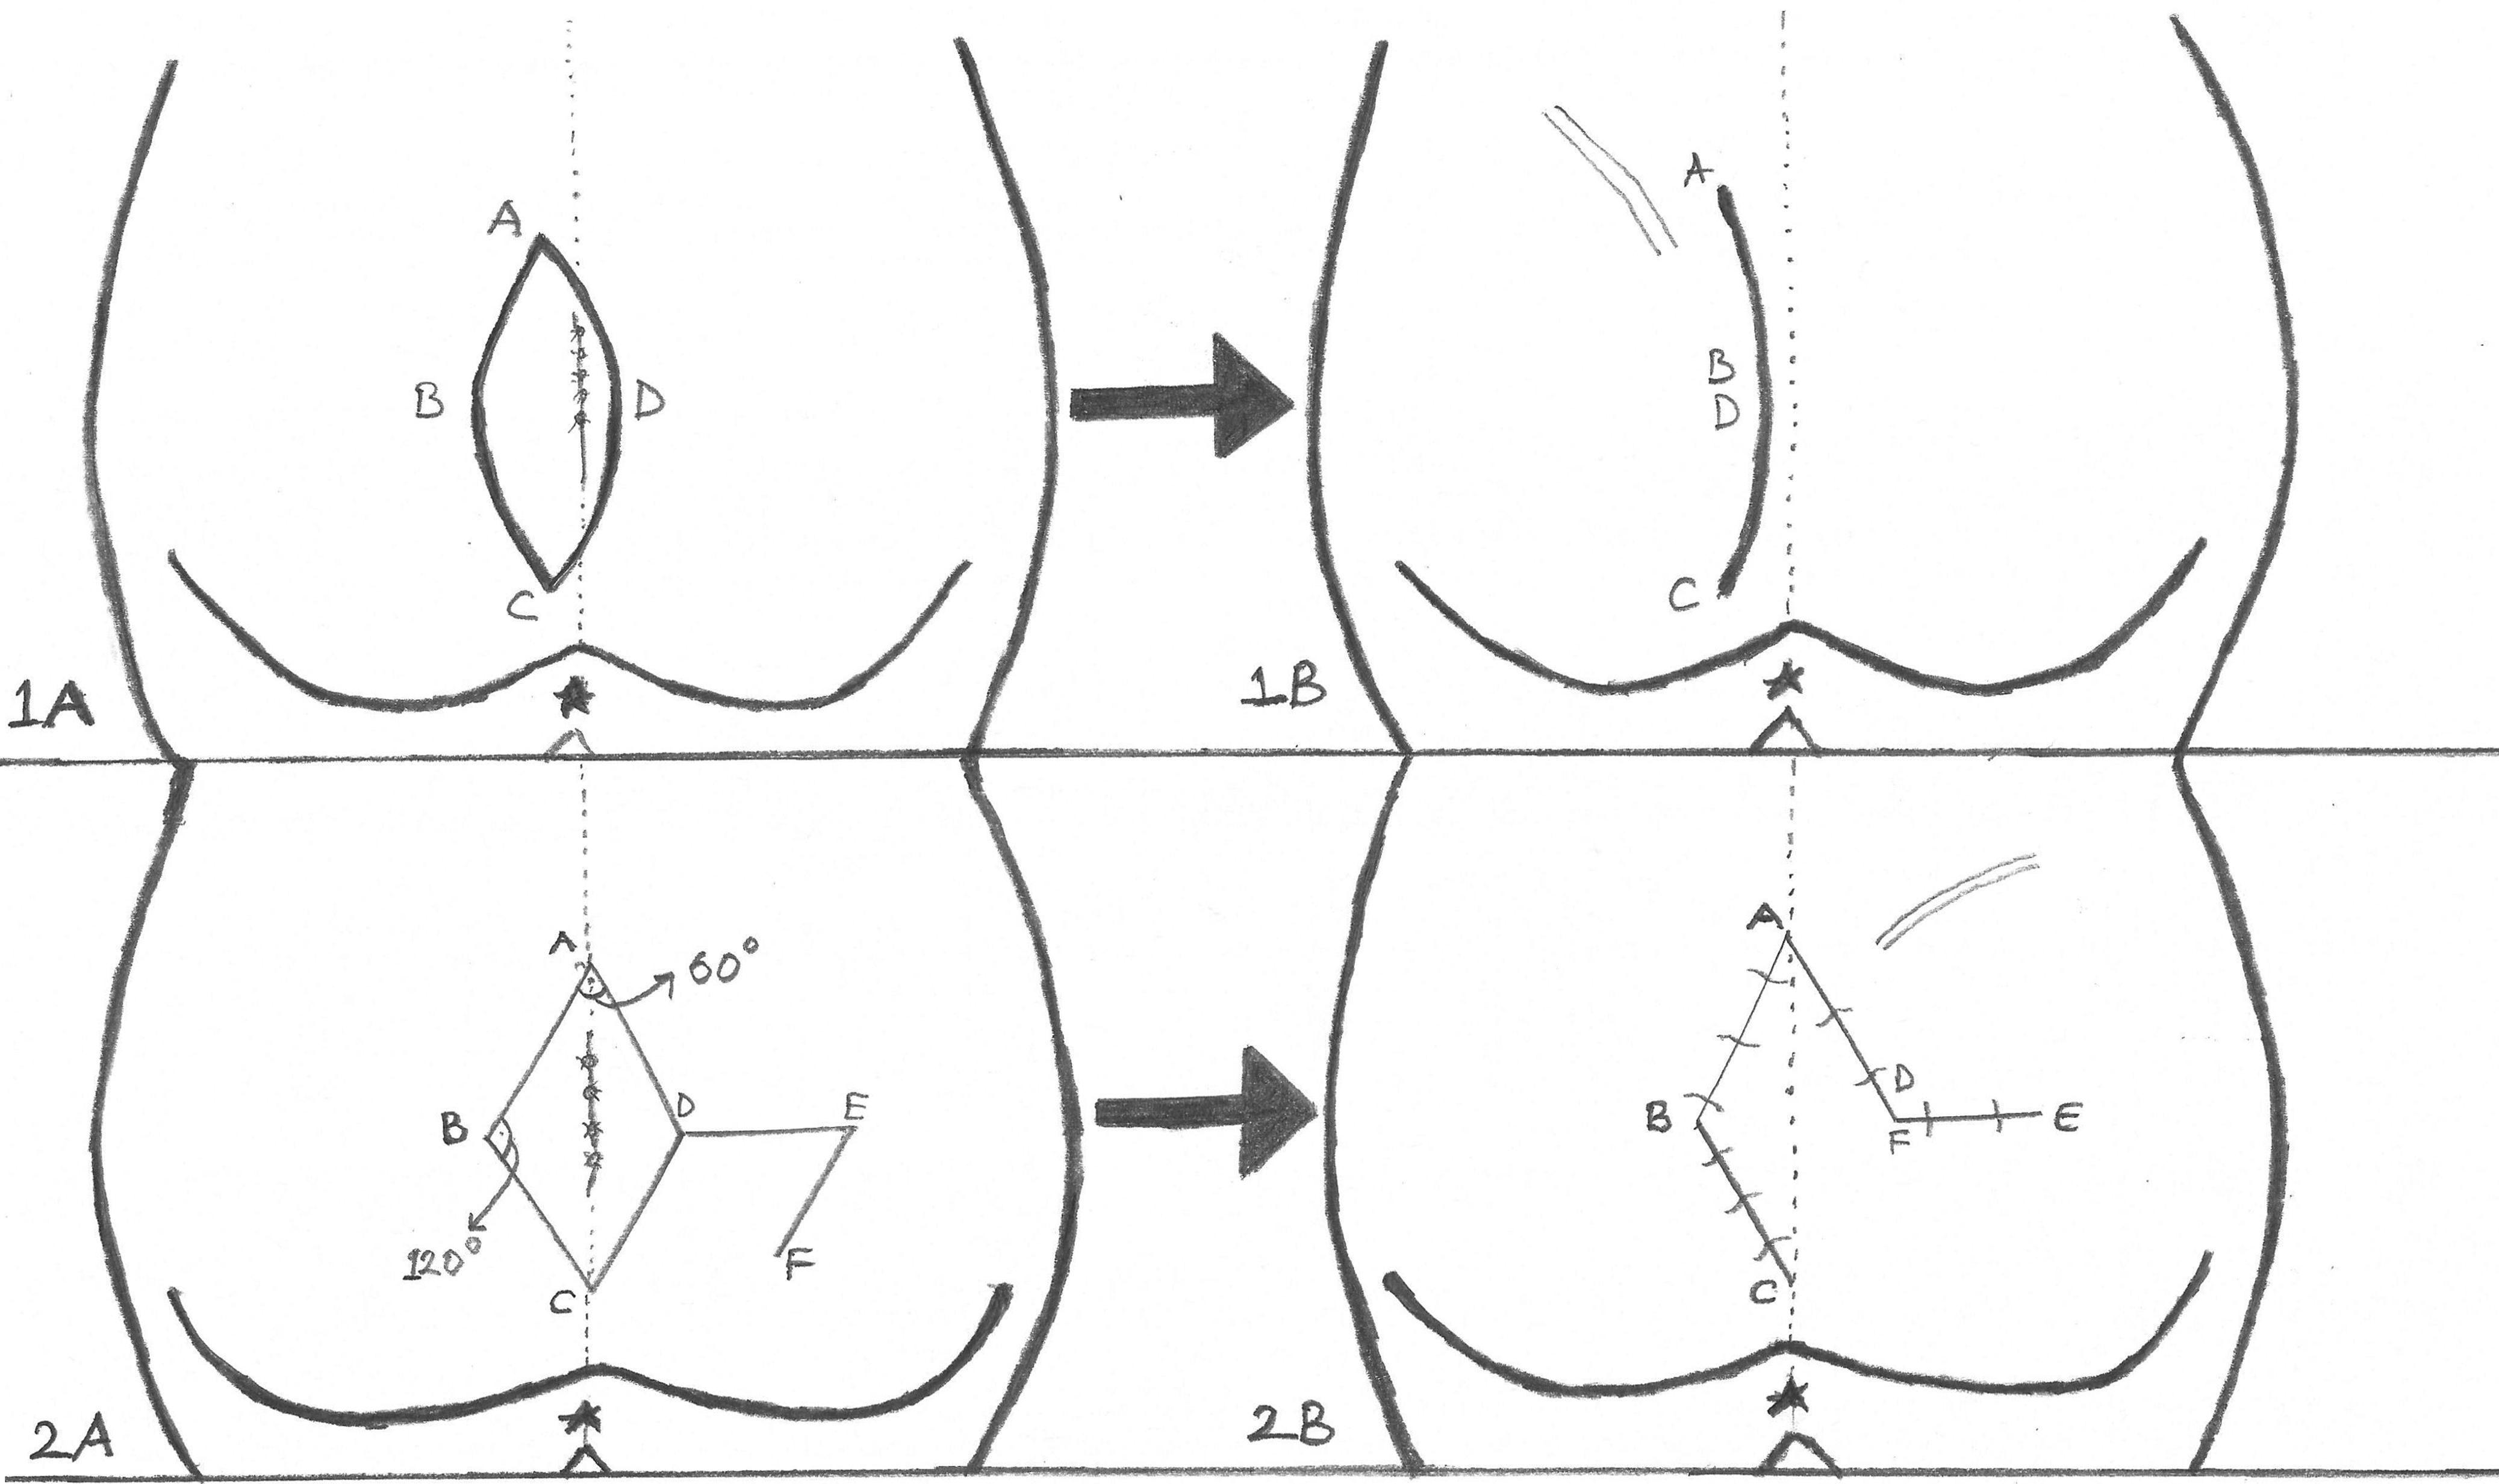 Limberg Flap Or Bascom For Pilonidal Cyst Plastic